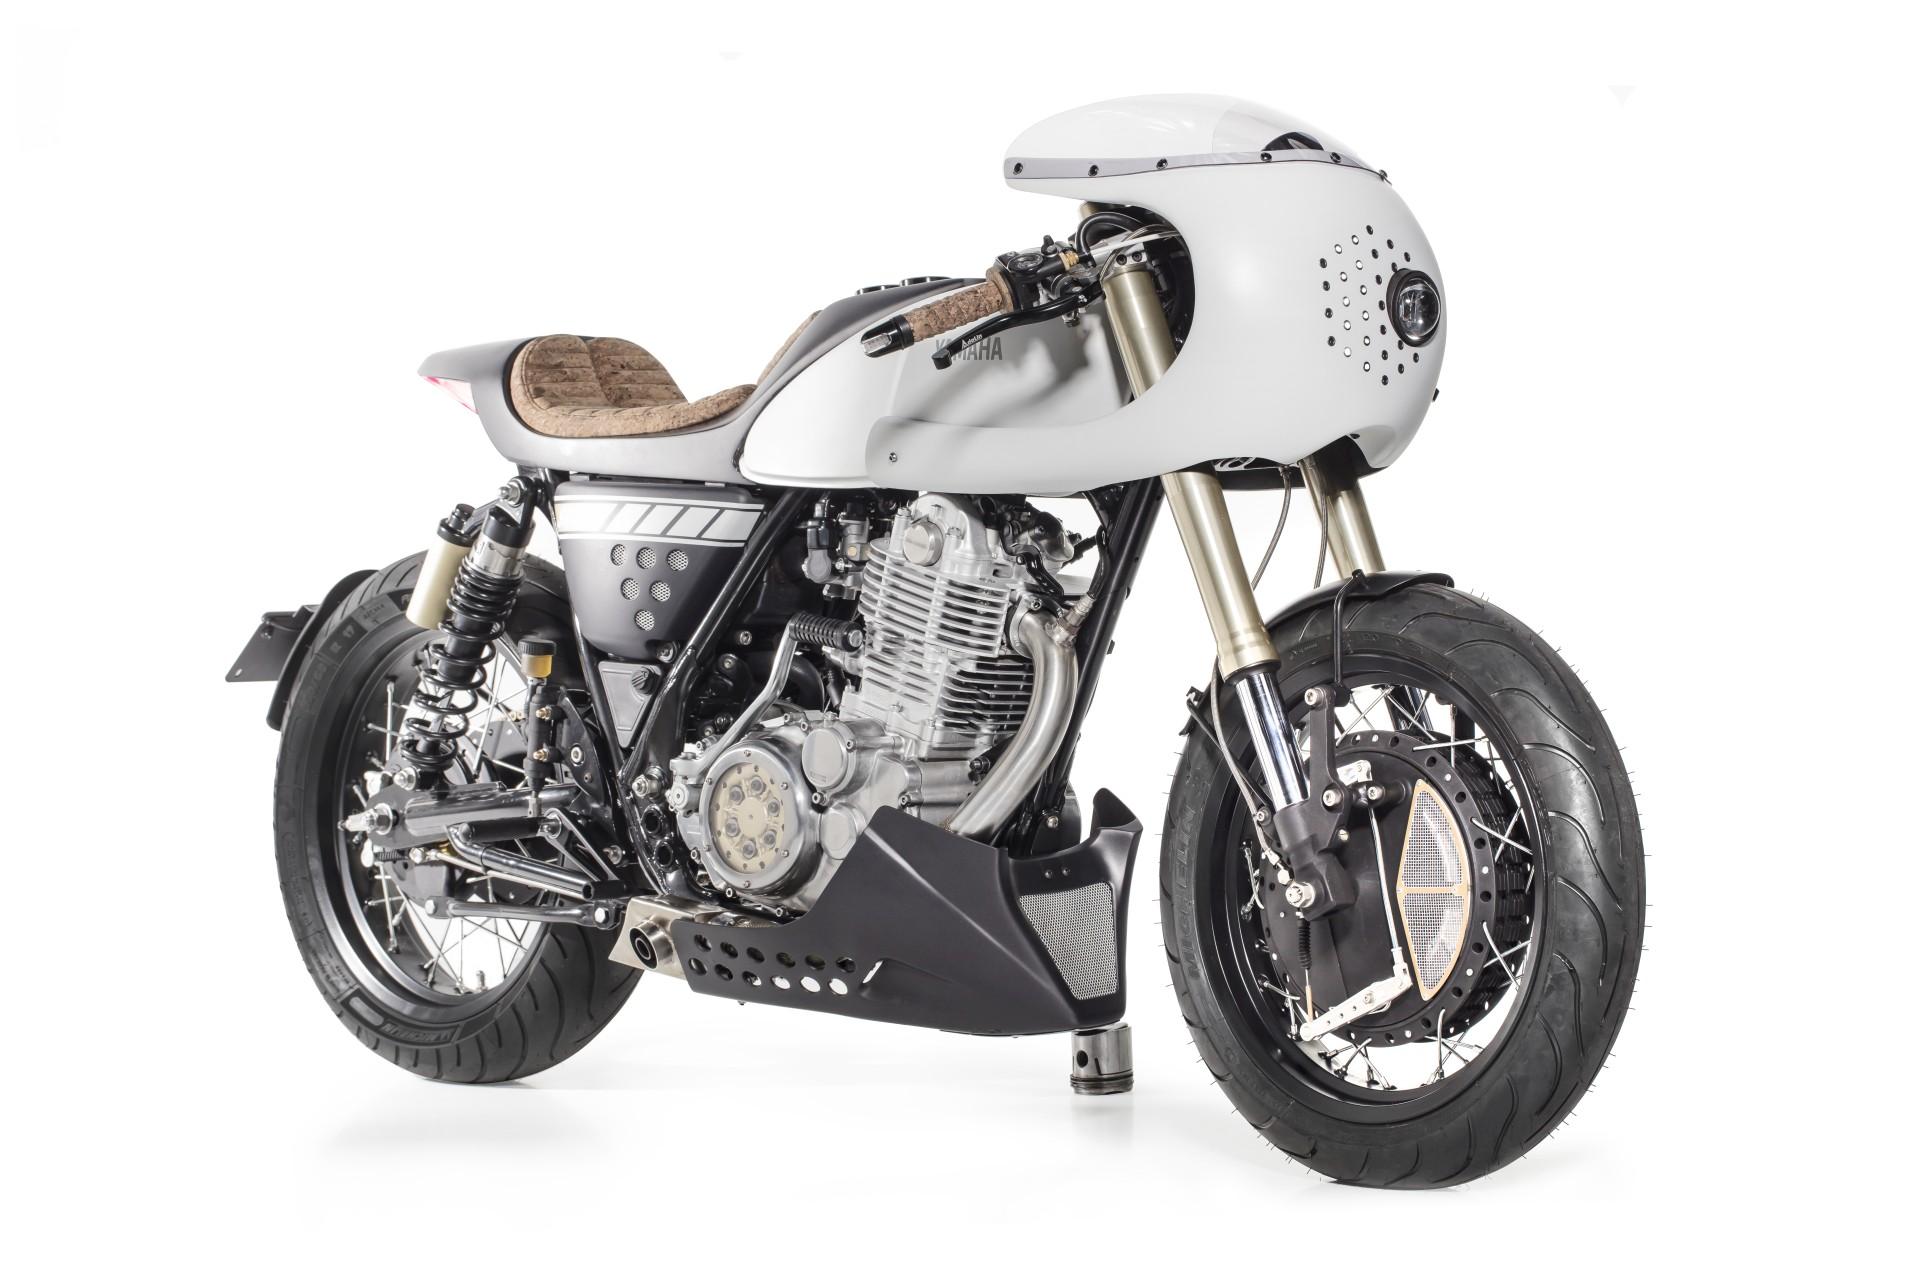 Yamaha SR 400 from Capêlo's Garage